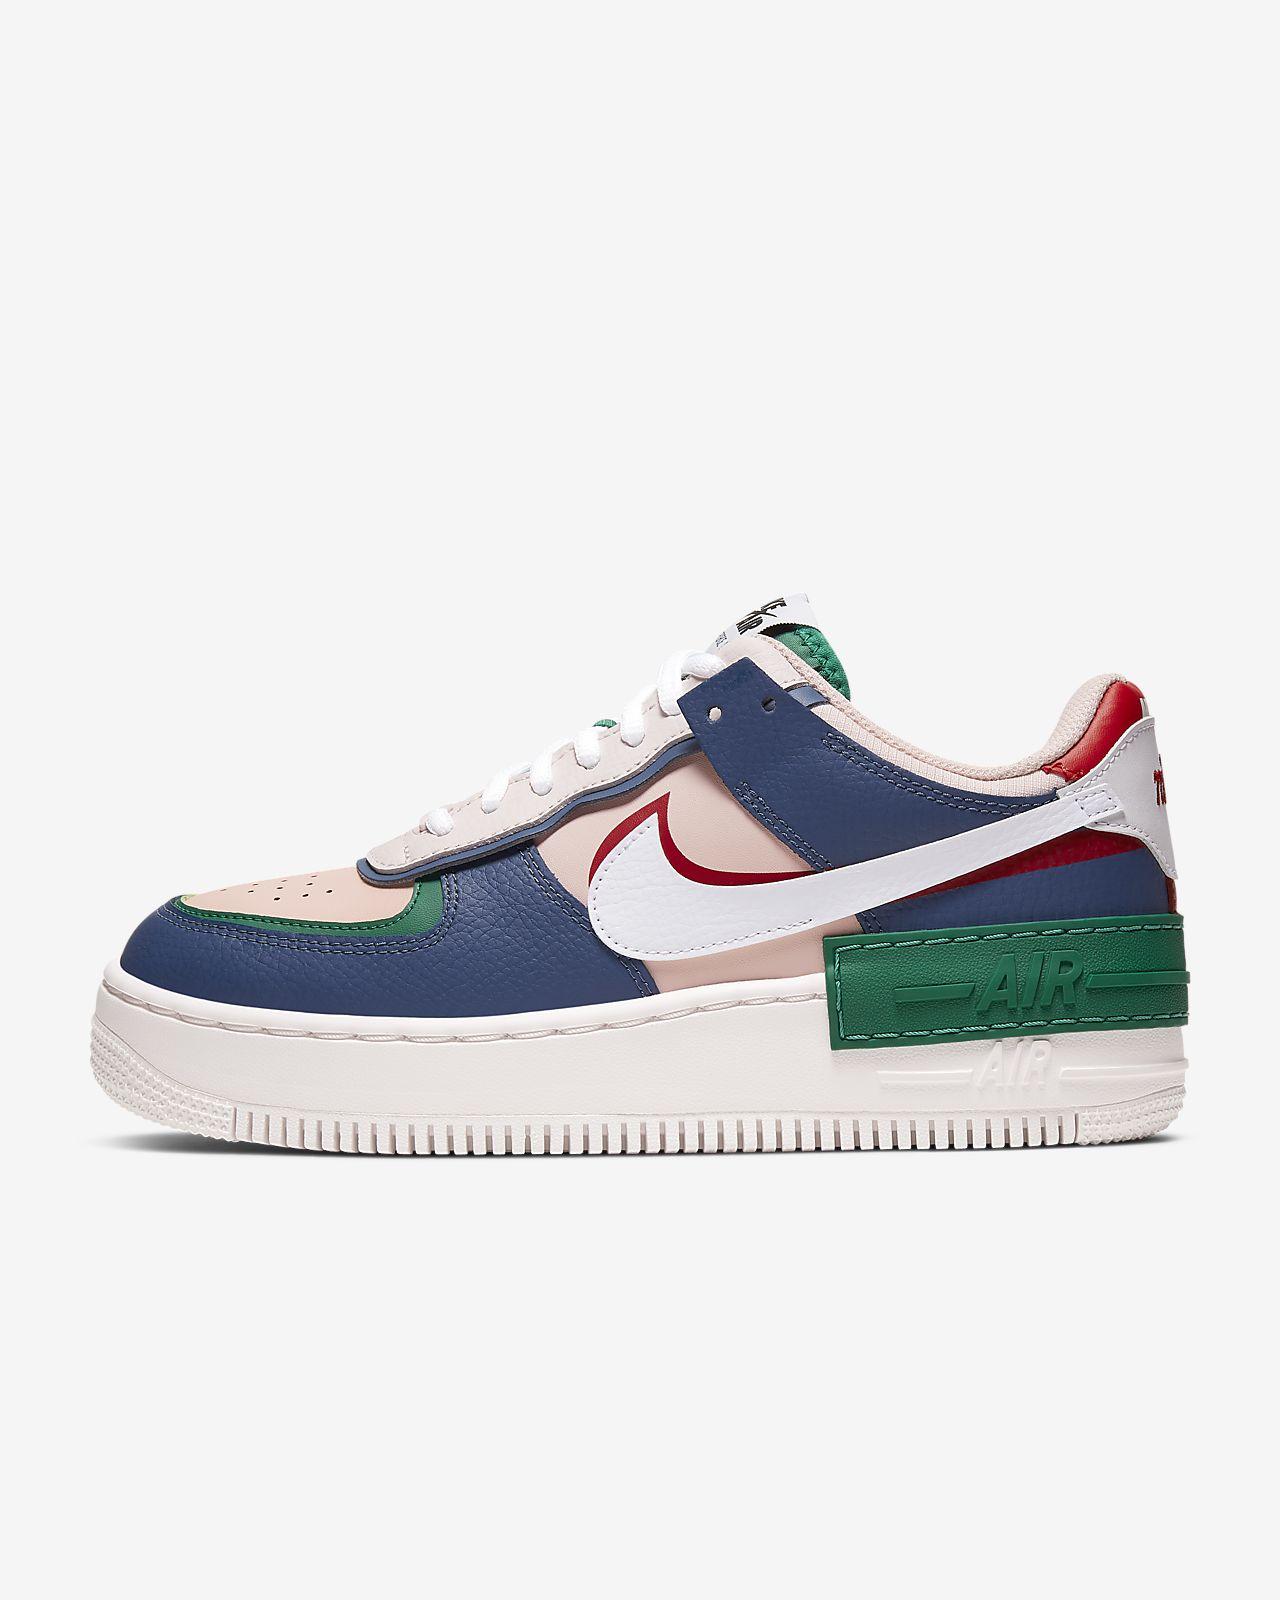 Nike Air Force One 1 Love T Shirt | SneakerFiles